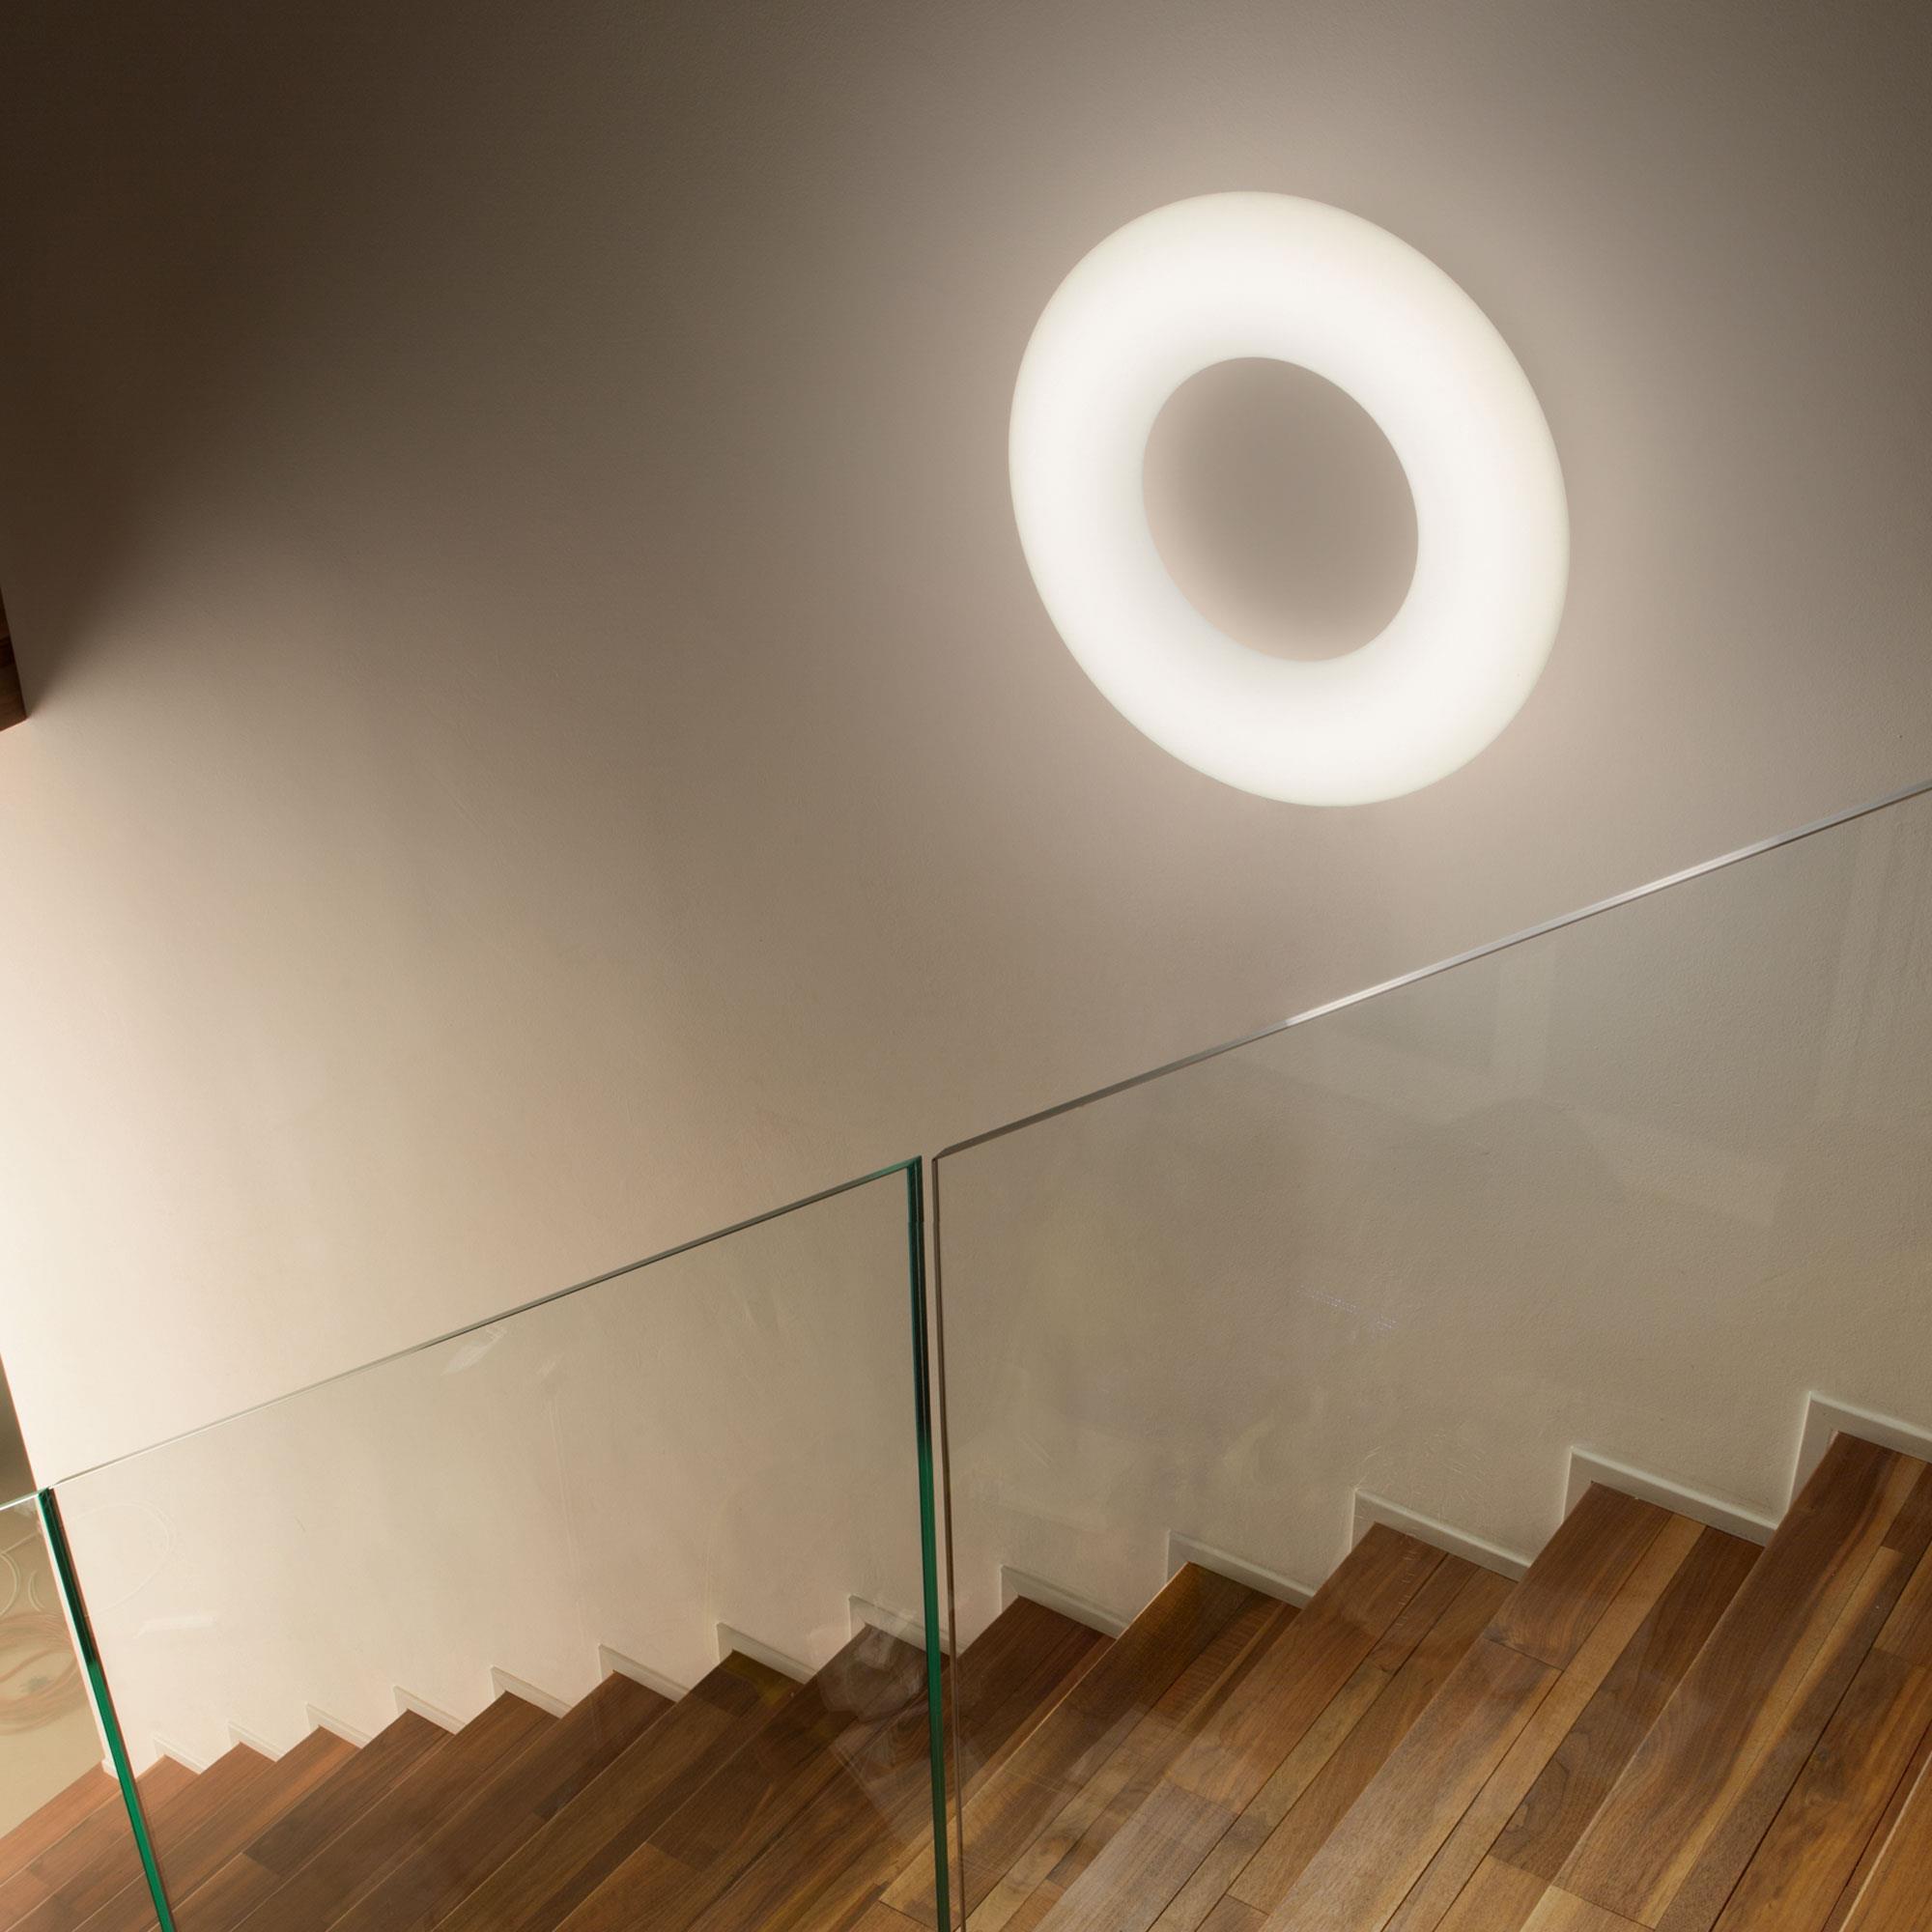 Ideal Lux 140544 POLO PL120 LED fali / mennyezeti lámpa